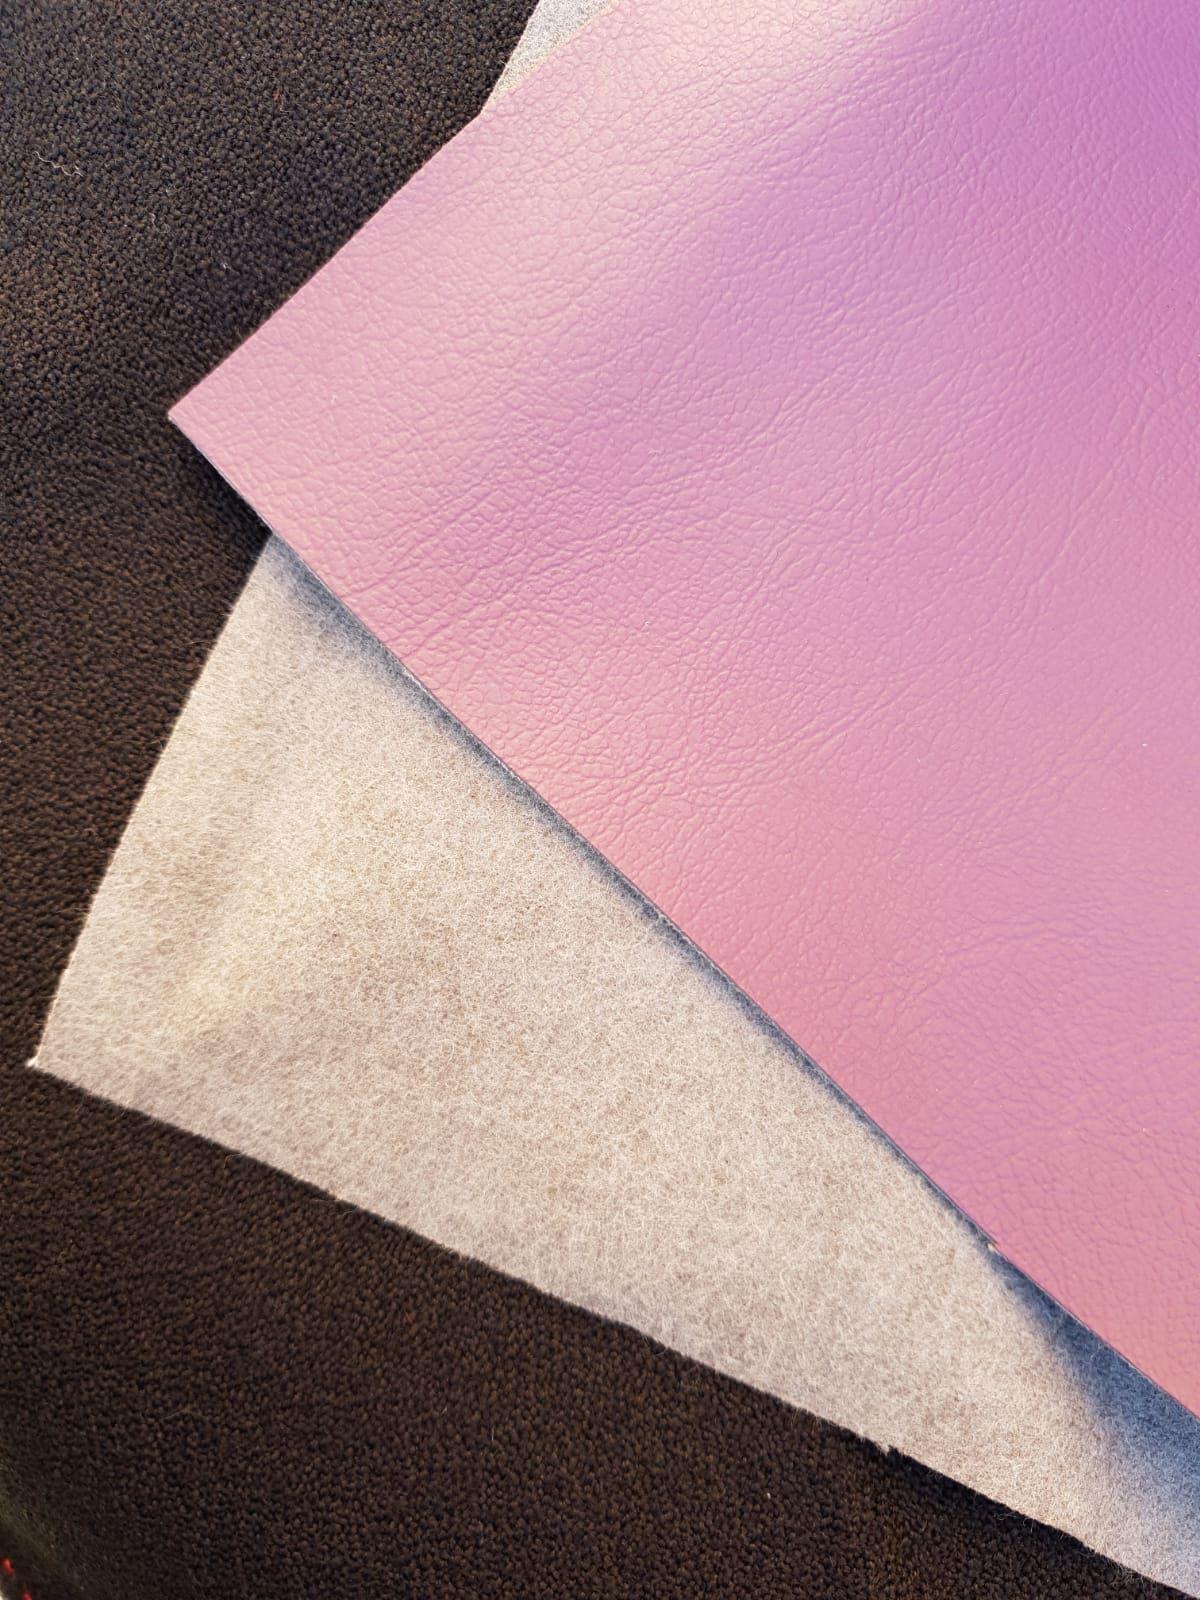 Plum Purple Craft Fabrics Upholstery Fabric Uk Leather Craft